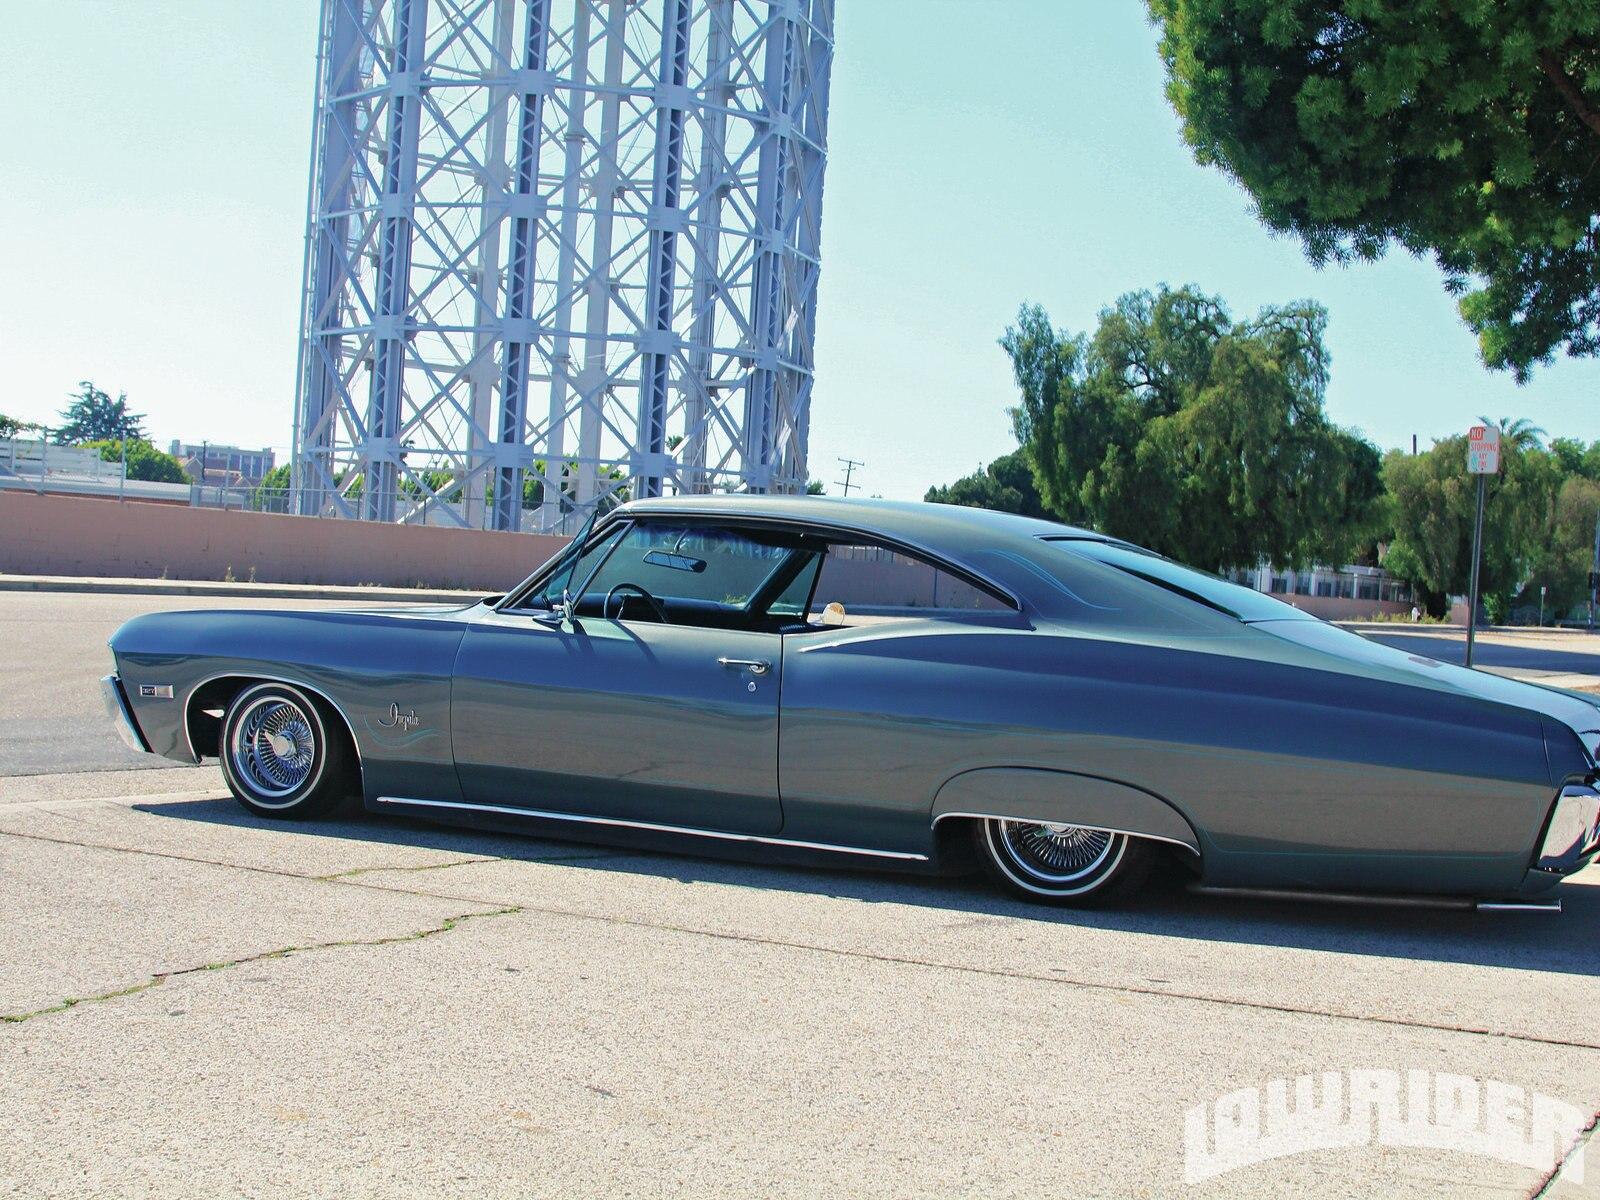 1109-lrmp-24-o-on-the-blvd-1968-chevy-impala2